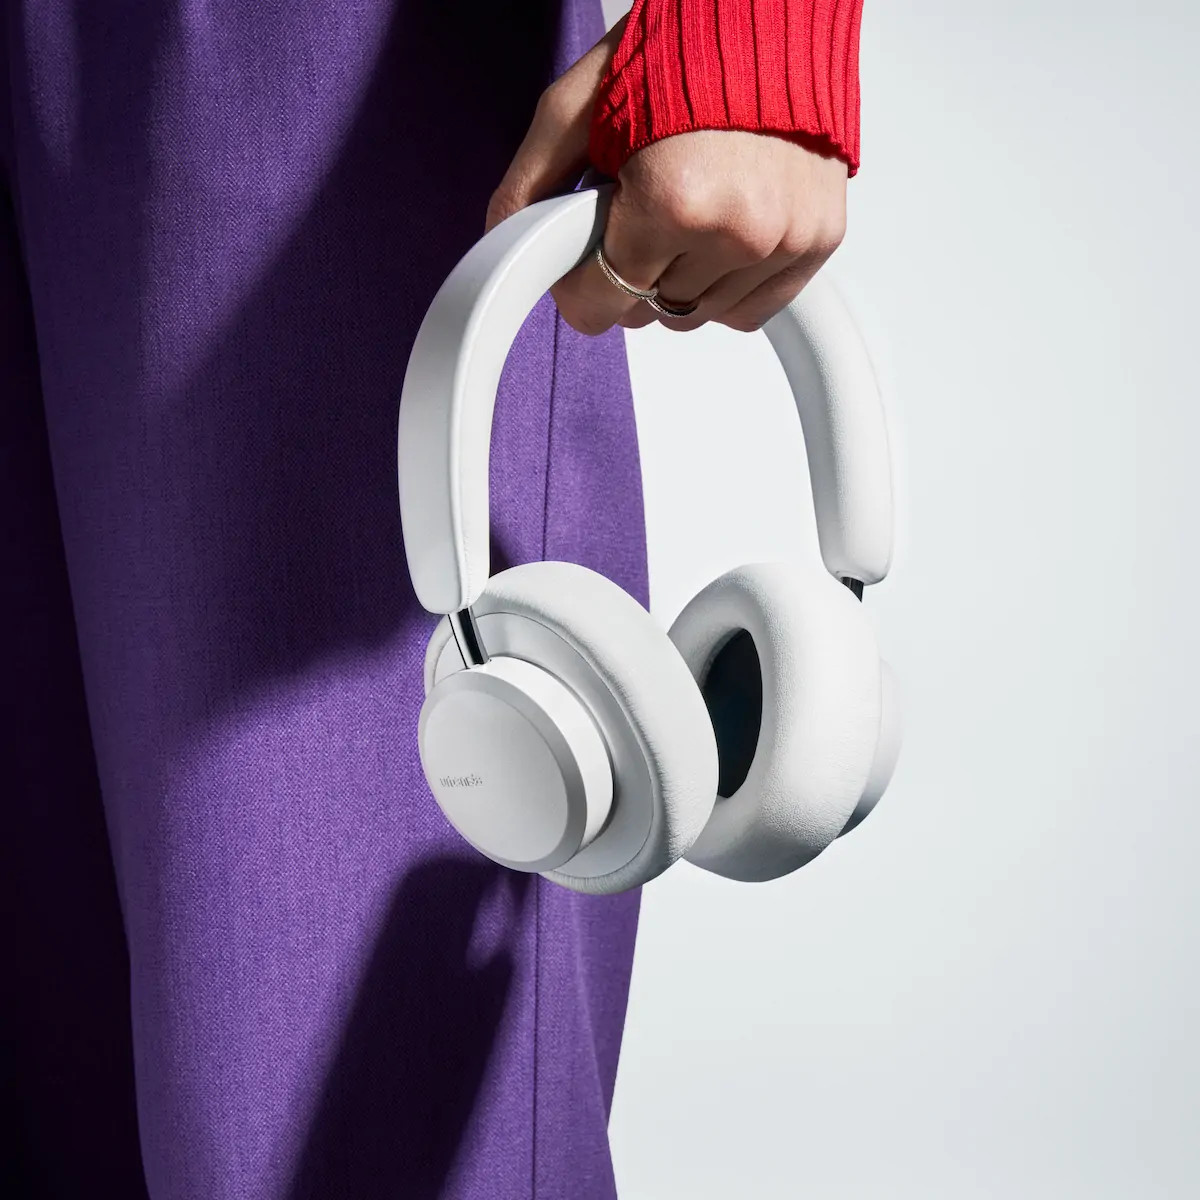 Безжични слушалки с микрофон Urbanista - Miami, ANC